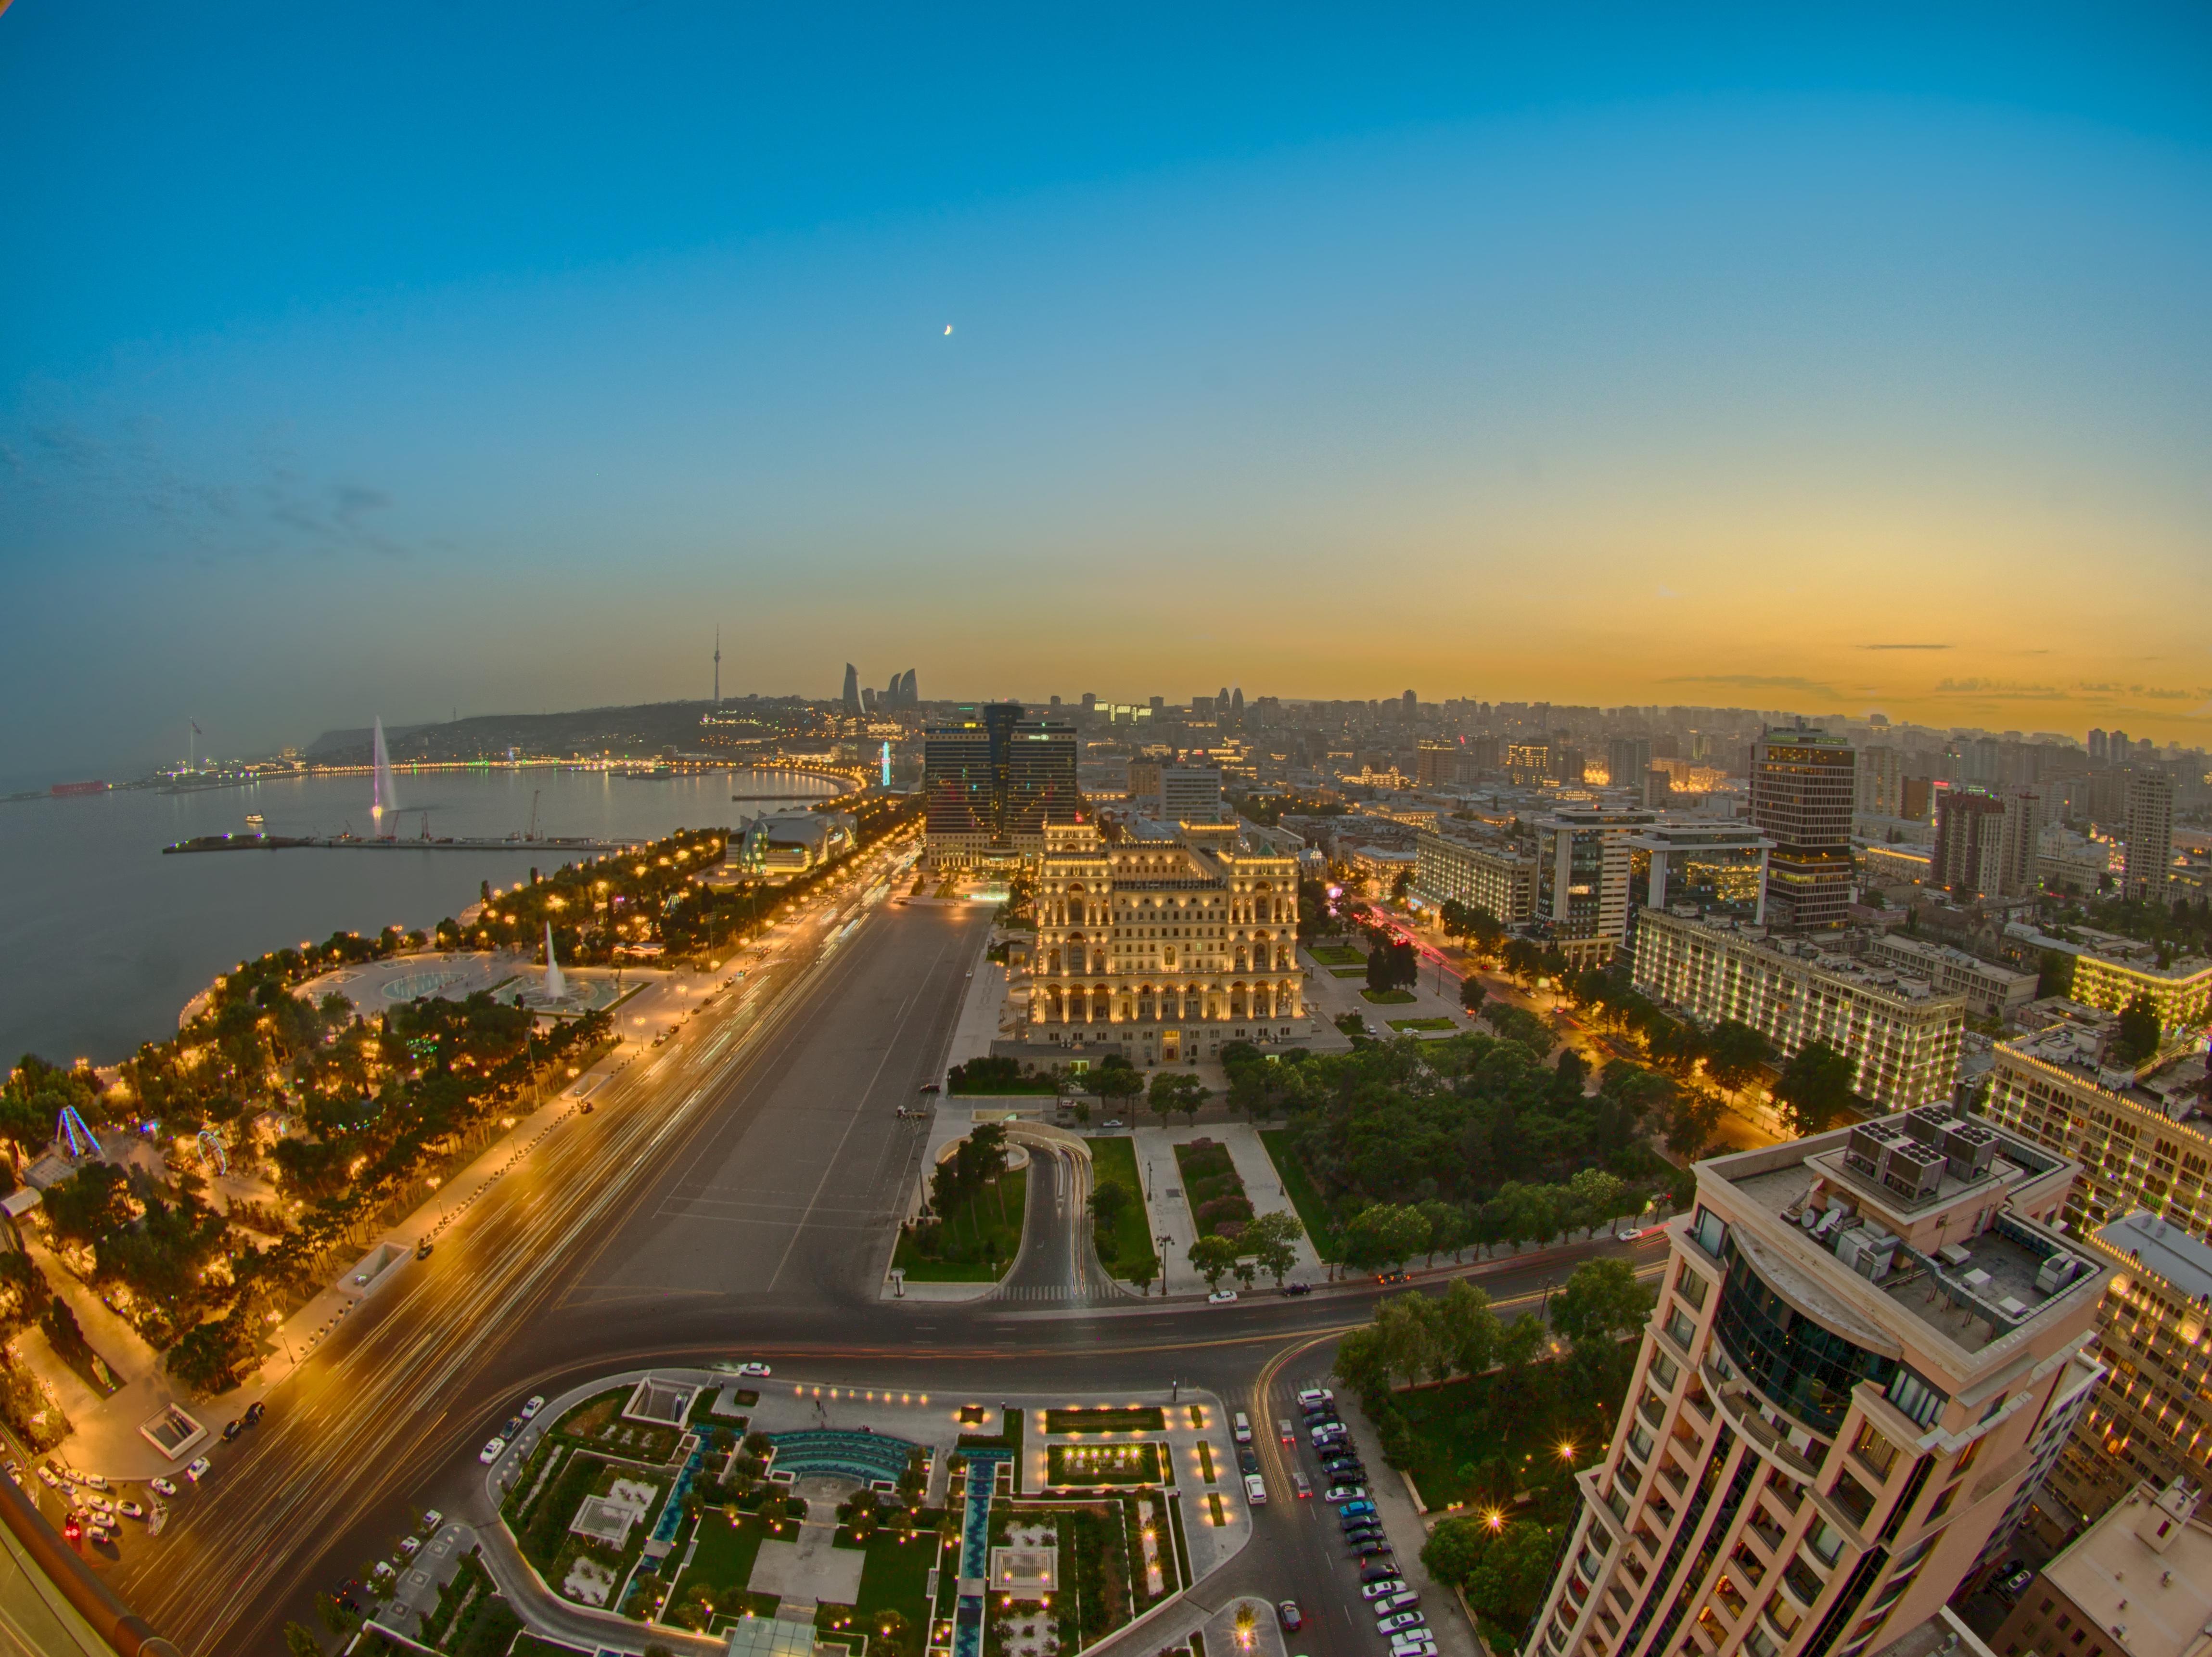 Orange Park Mall >> Elevation of Baku, Azerbaijan - Topographic Map - Altitude Map